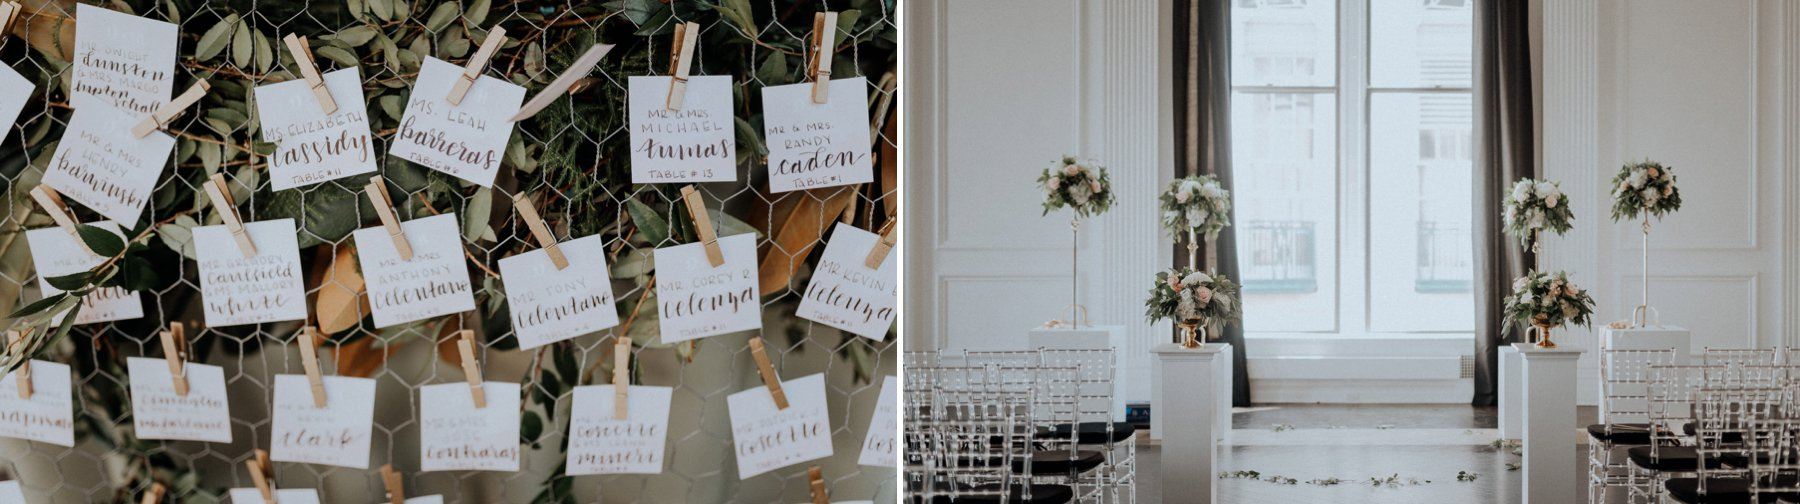 197-192-bartram-gardens-wedding-18.jpg